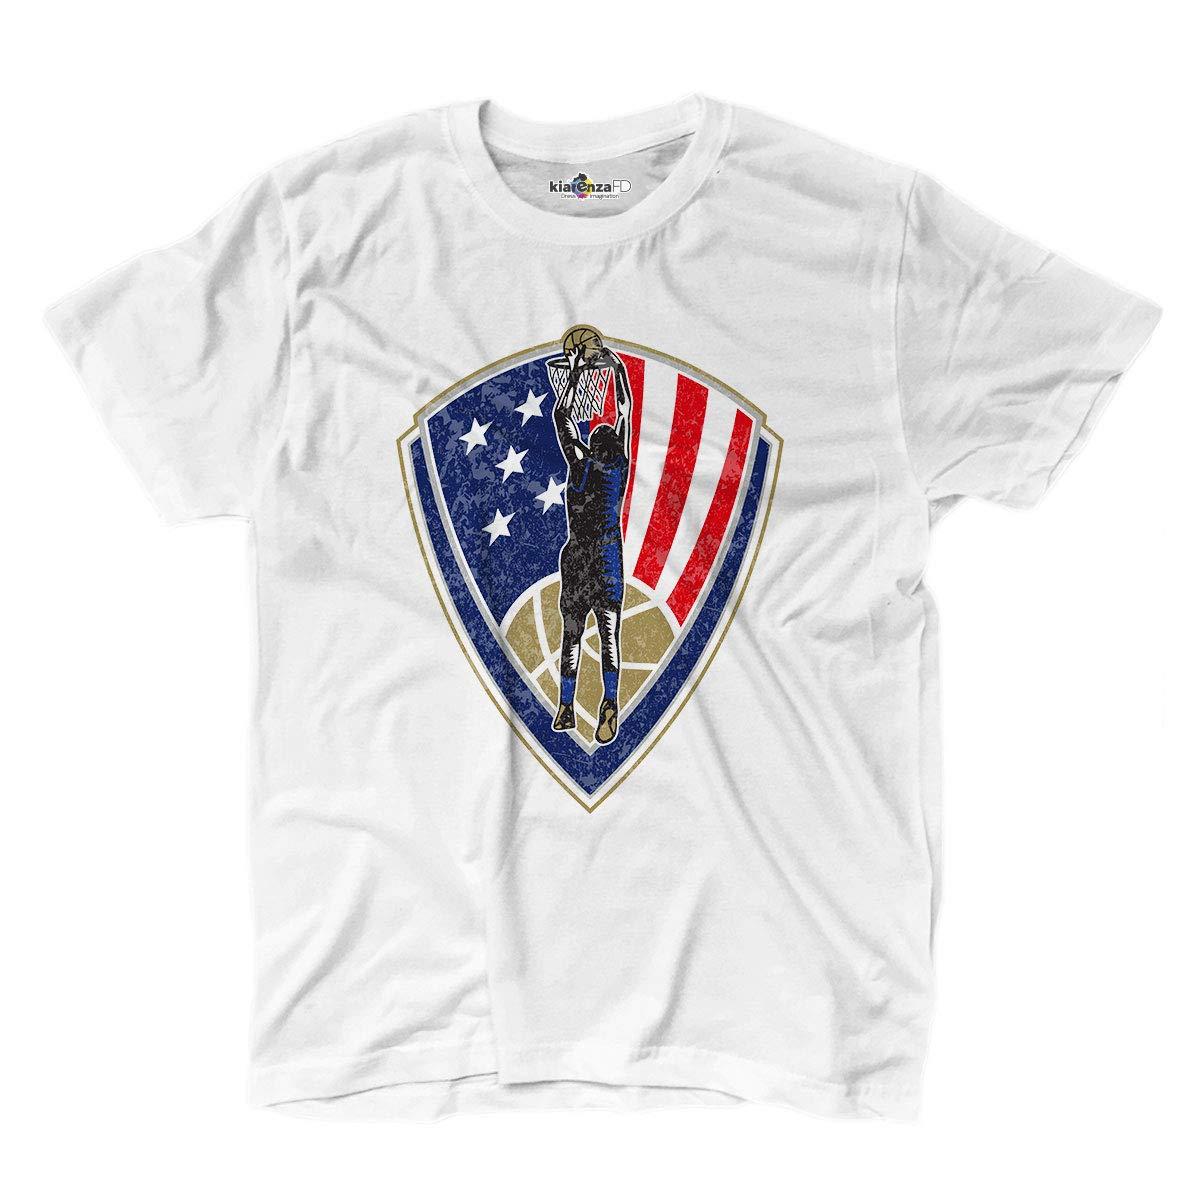 KiarenzaFD - Camiseta para Camiseta de Baloncesto USA Slam All ...